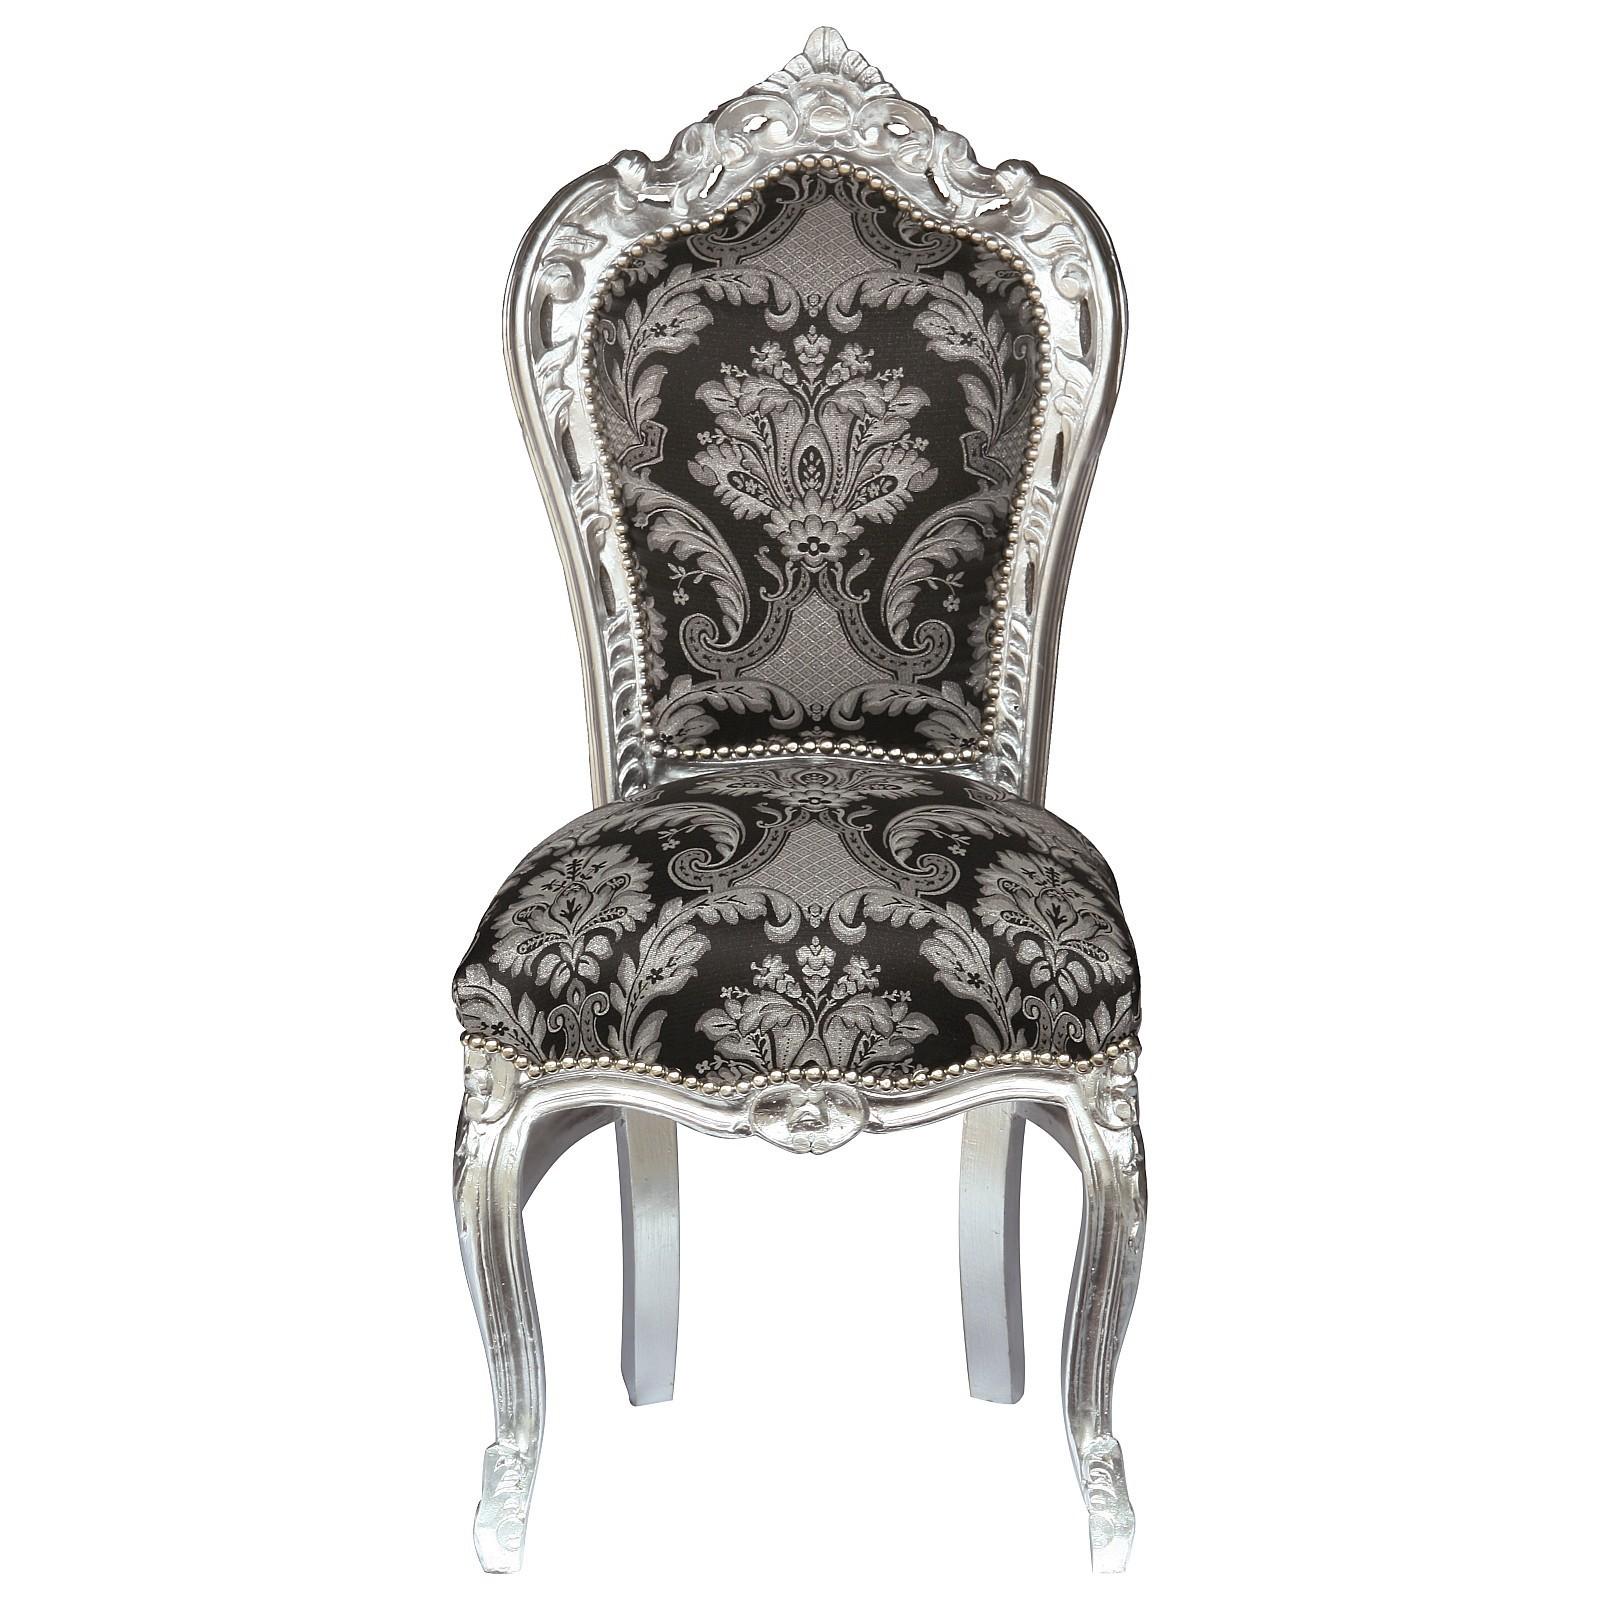 prunkvoller stuhl mit hochwertigem stoffbezug in schwarz. Black Bedroom Furniture Sets. Home Design Ideas